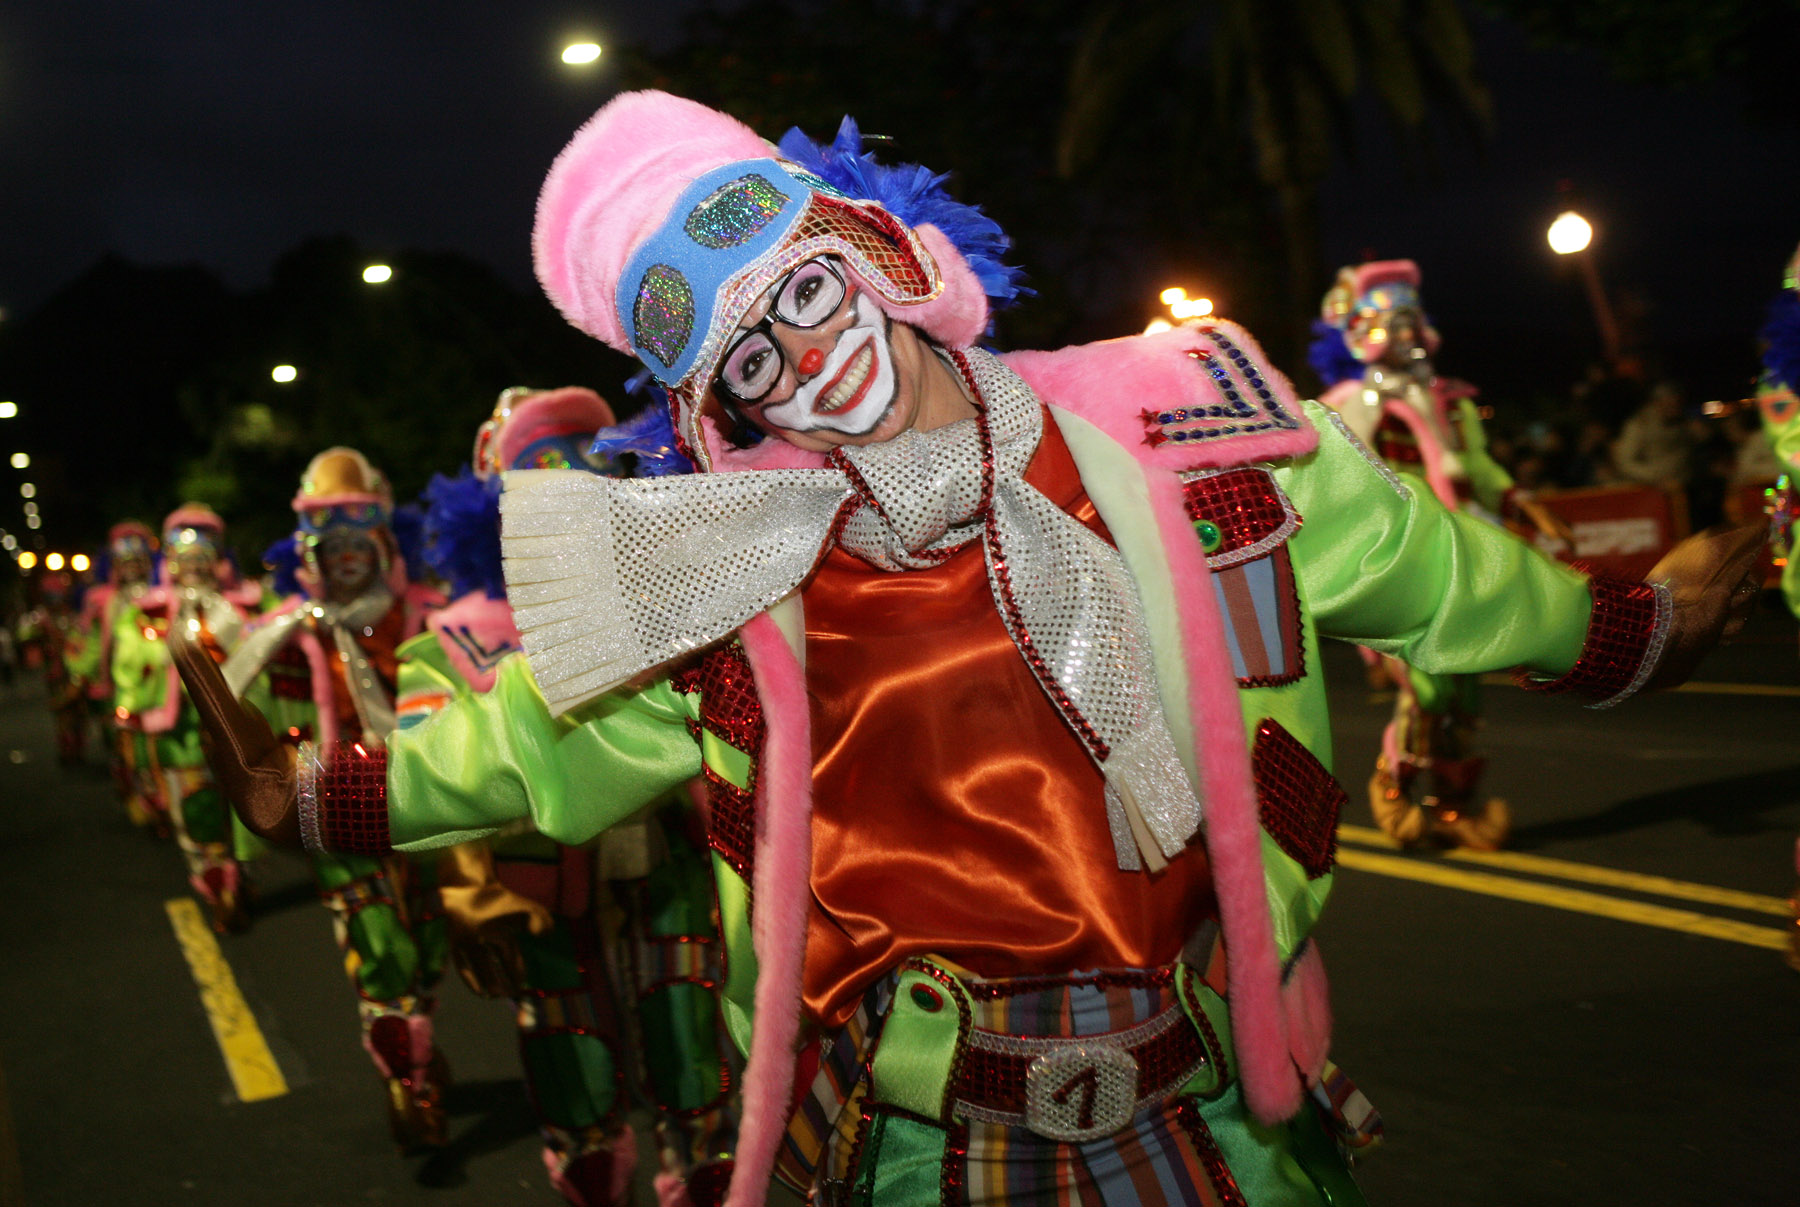 0Праздничная кавалькада на карнавале Санта-Крус-де-Тенерифе 2014